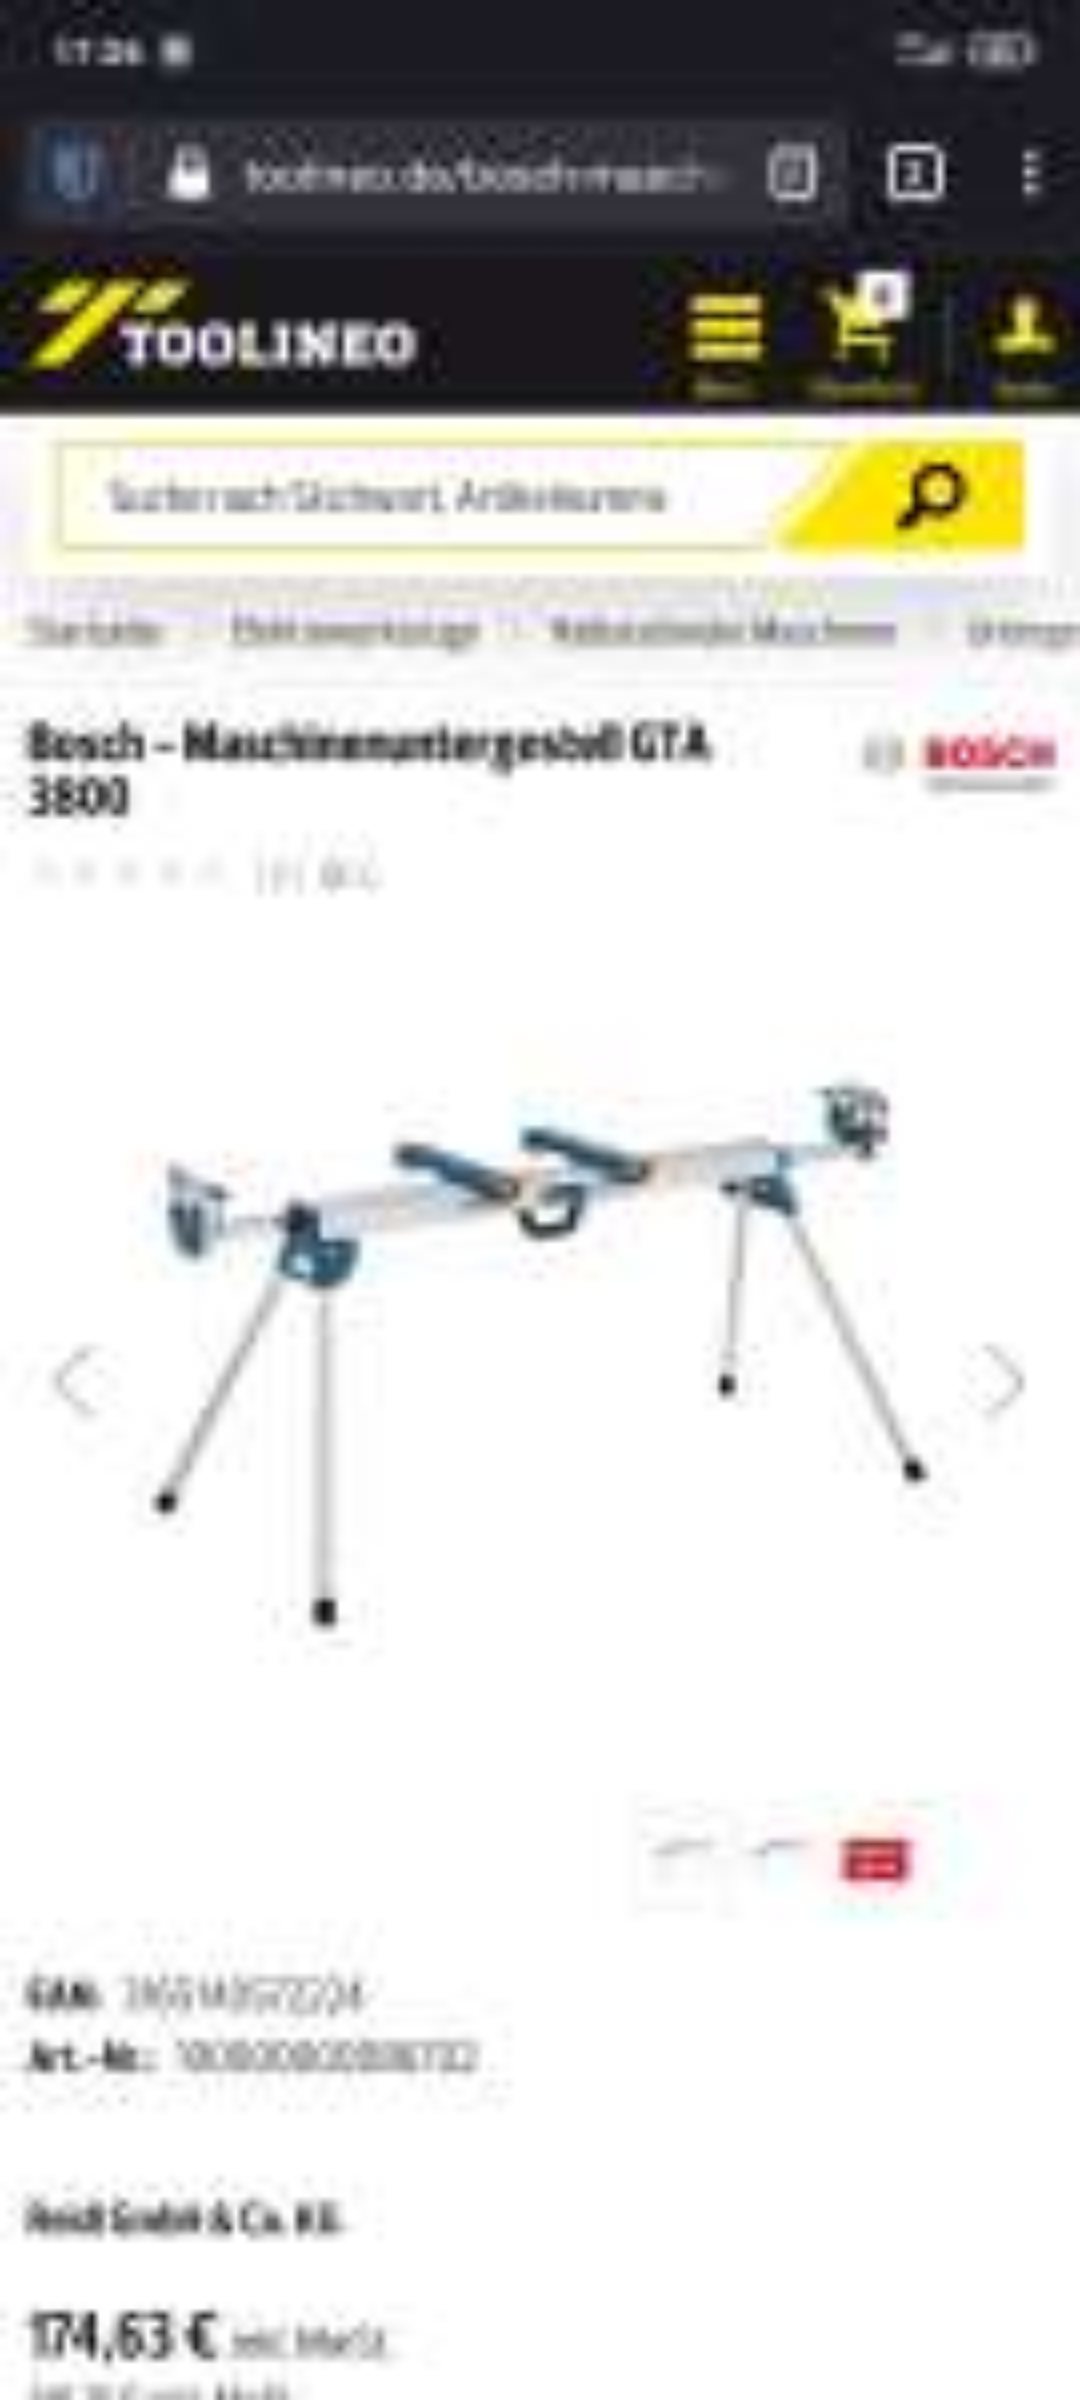 Bosch GTA 3800 Gestell für Säge, Kappsäge